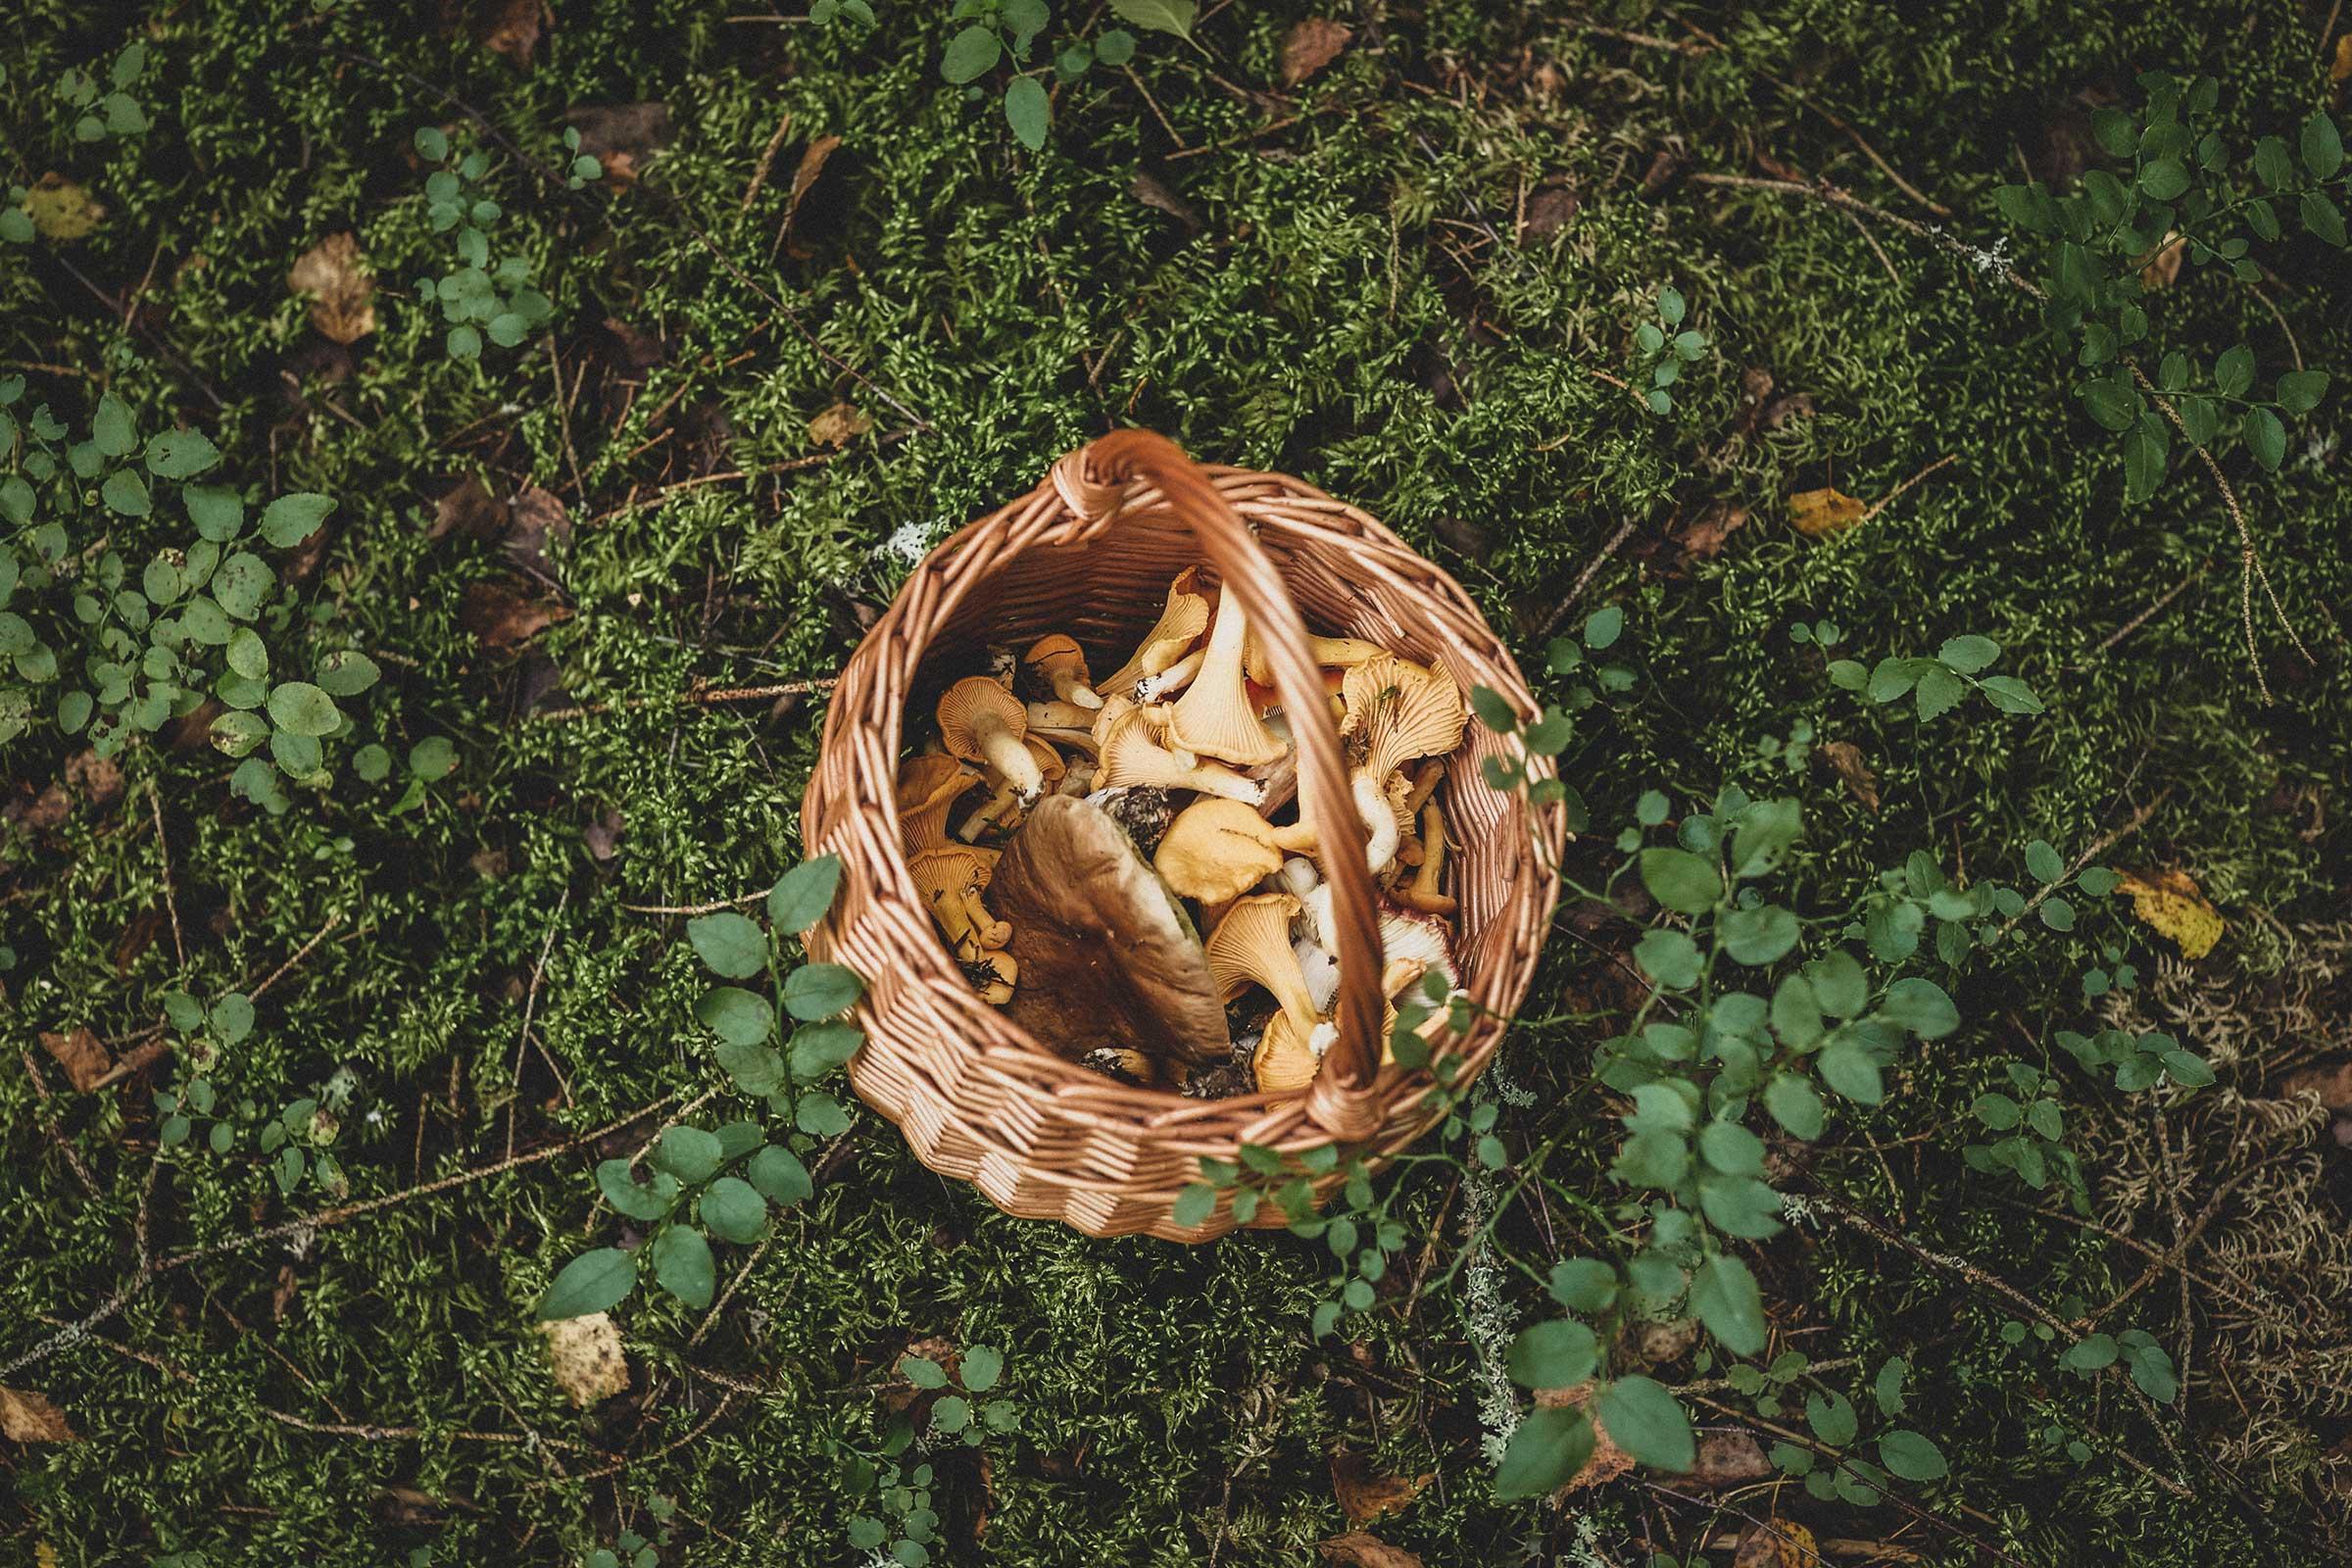 kantarelle mushrooms